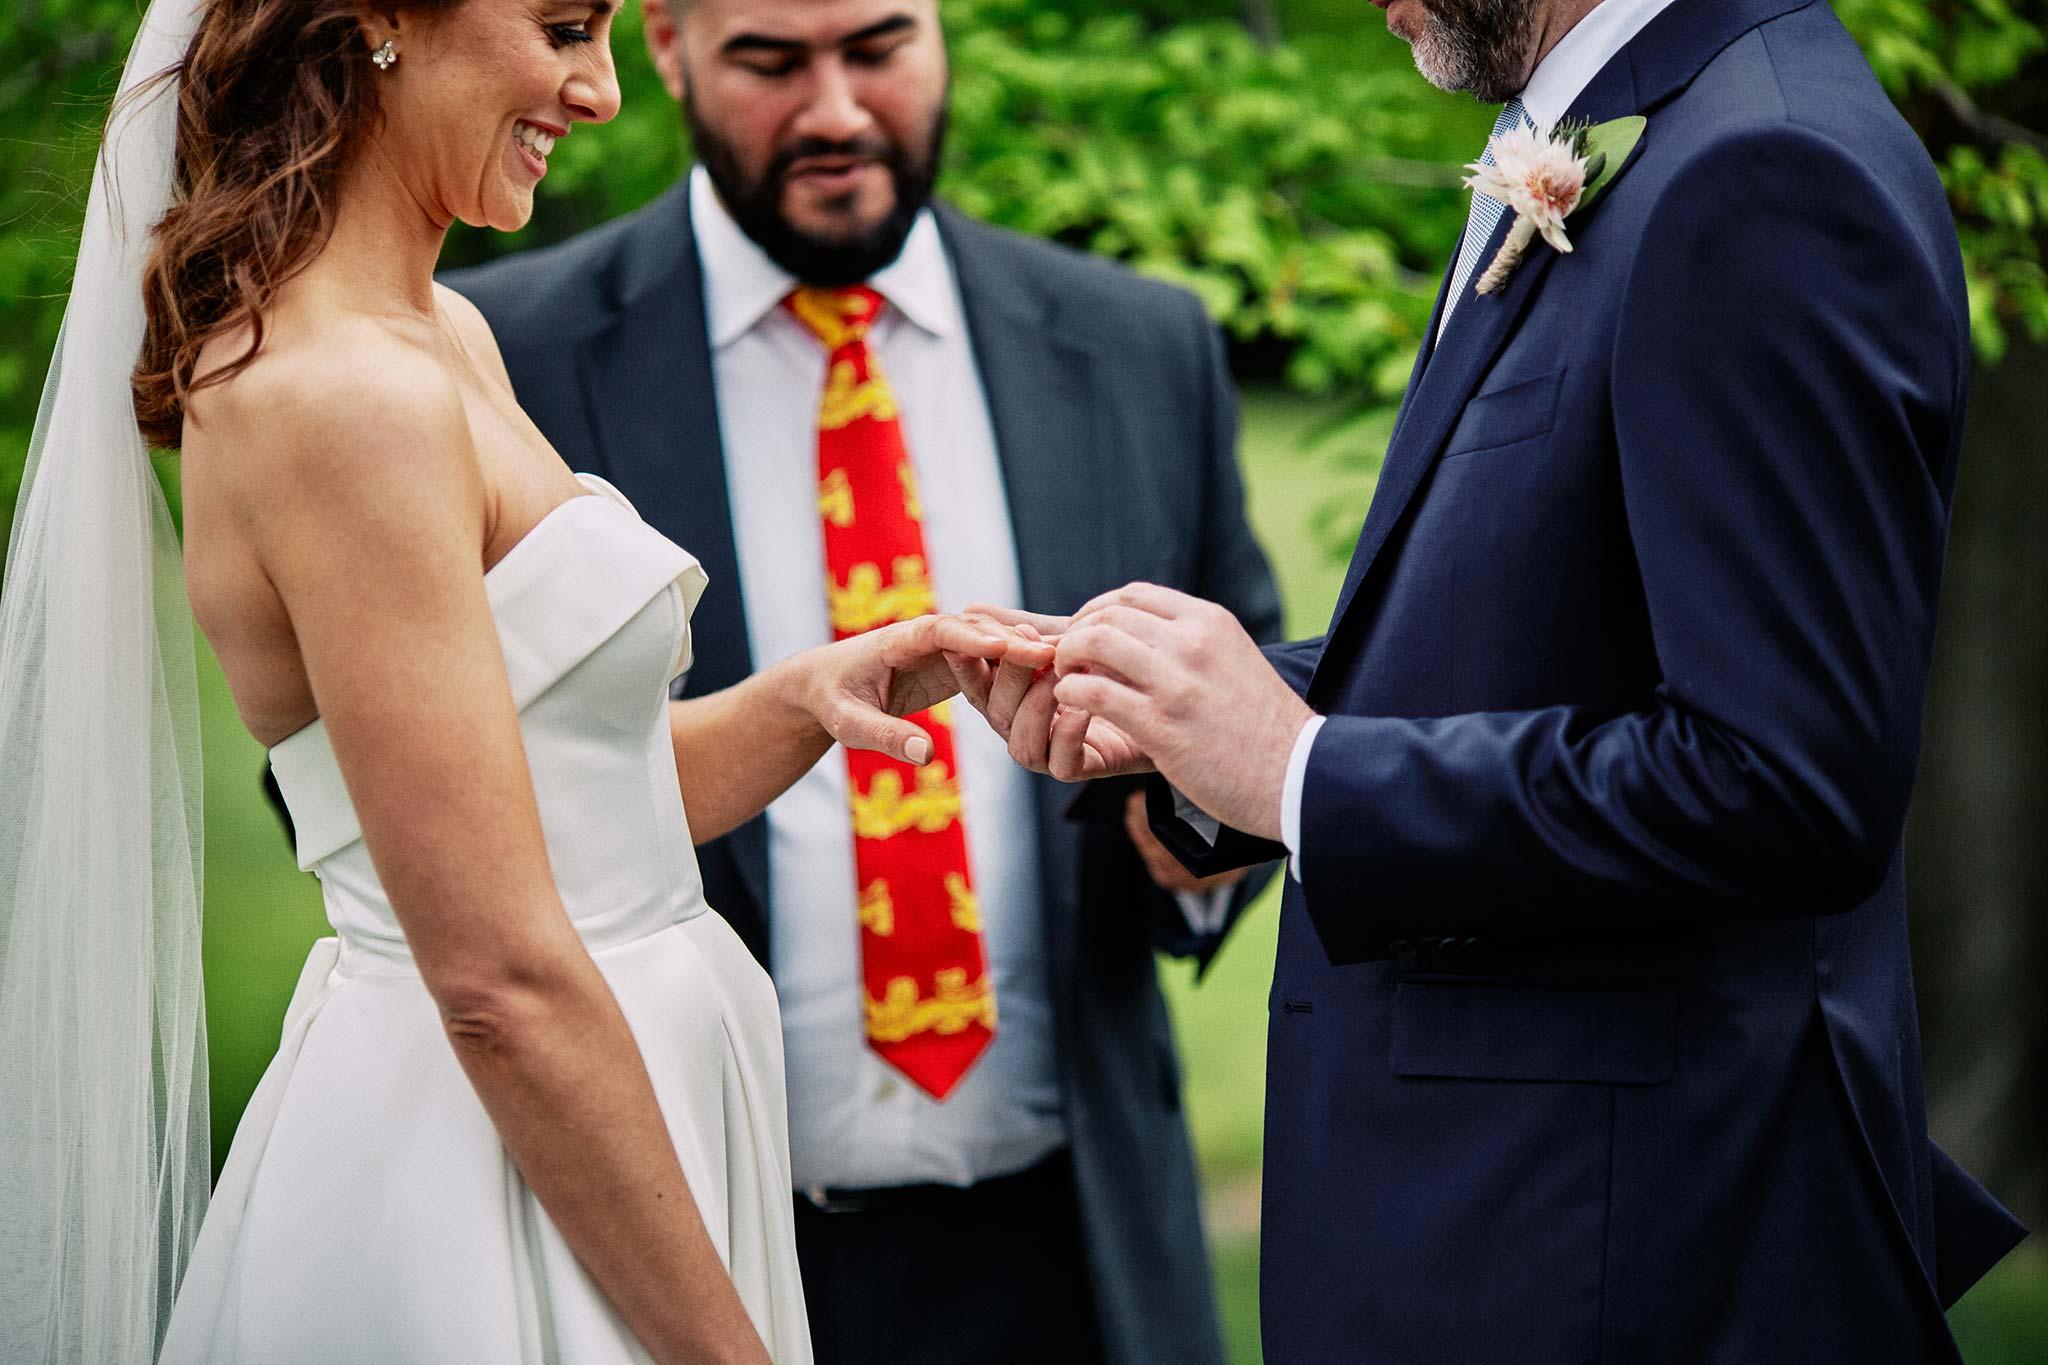 Melbourne Royal Botanical Garden Wedding Ceremony ring